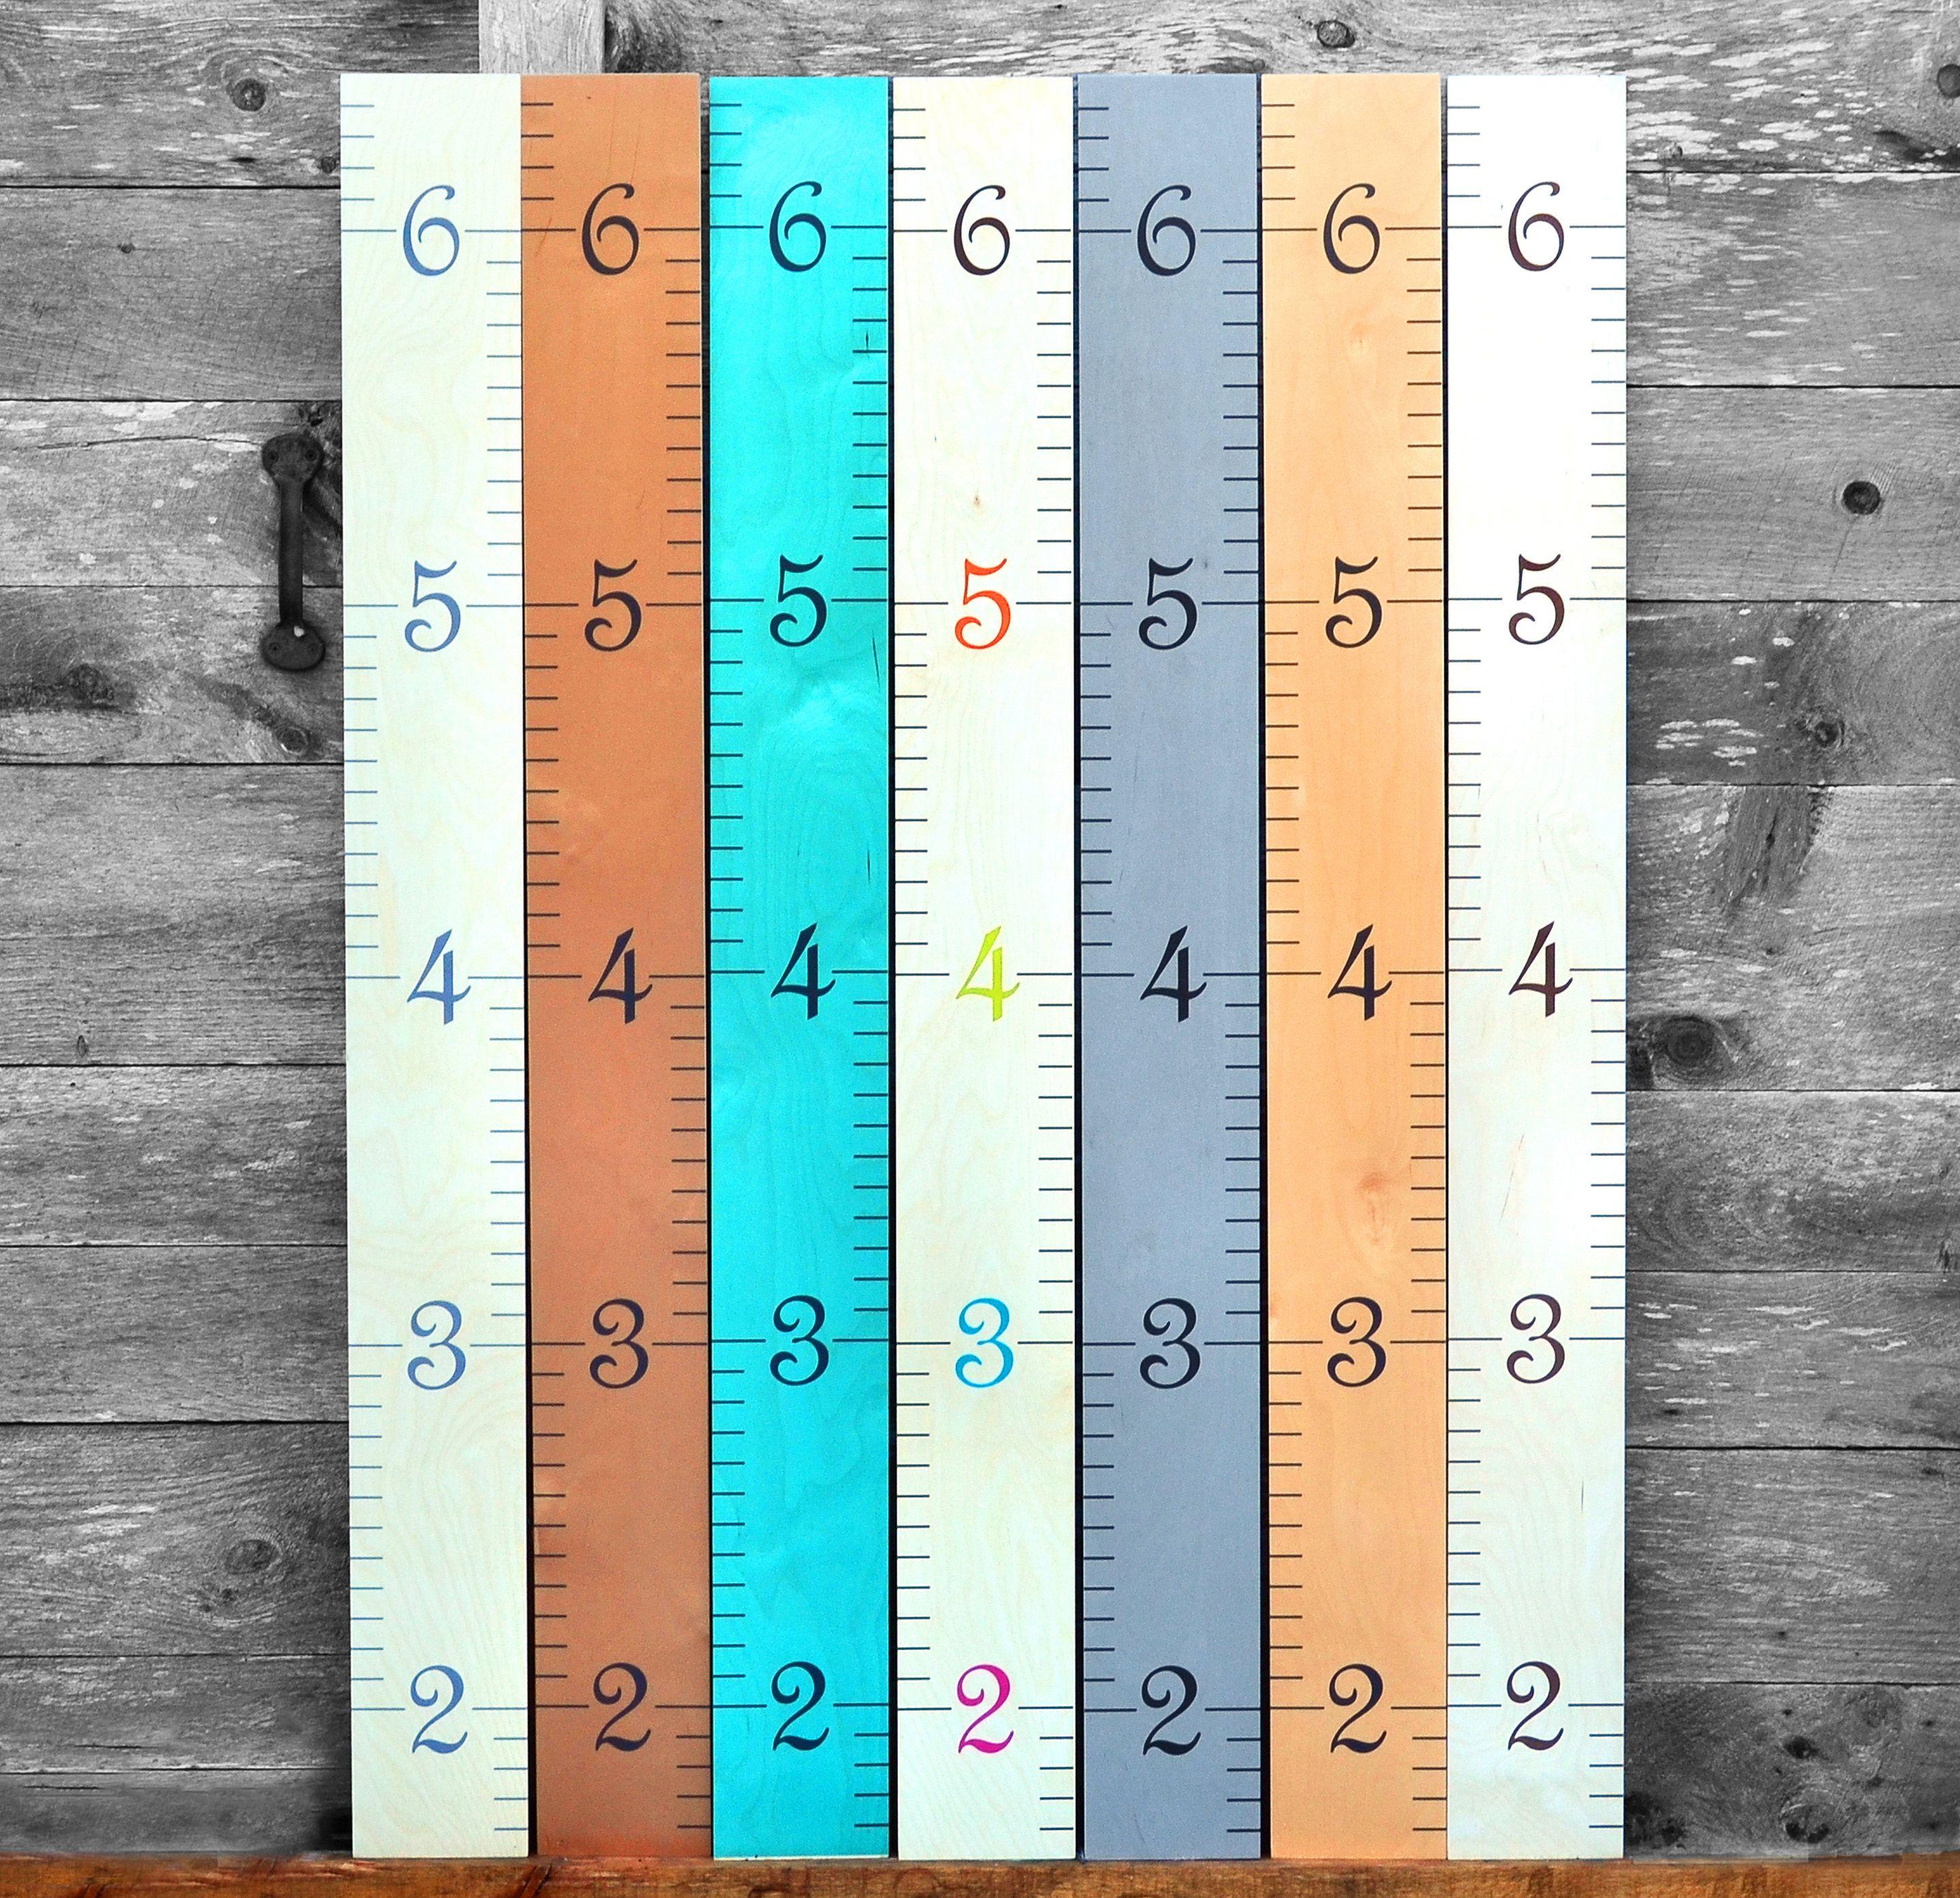 Wooden ruler growth chart kids wood height chart personalized wooden ruler growth chart kids wood height chart personalized child wall hanging ruler nvjuhfo Choice Image